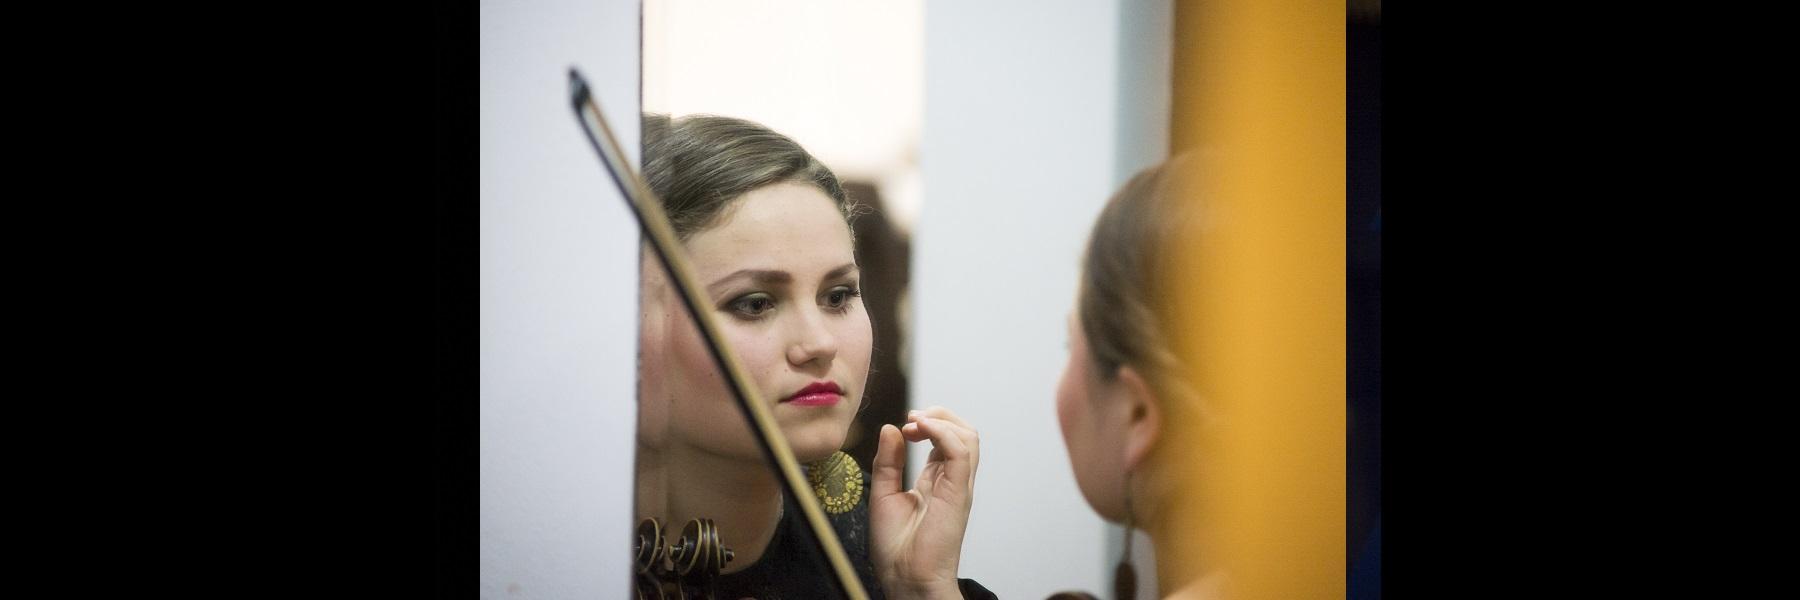 lipstick1800x600